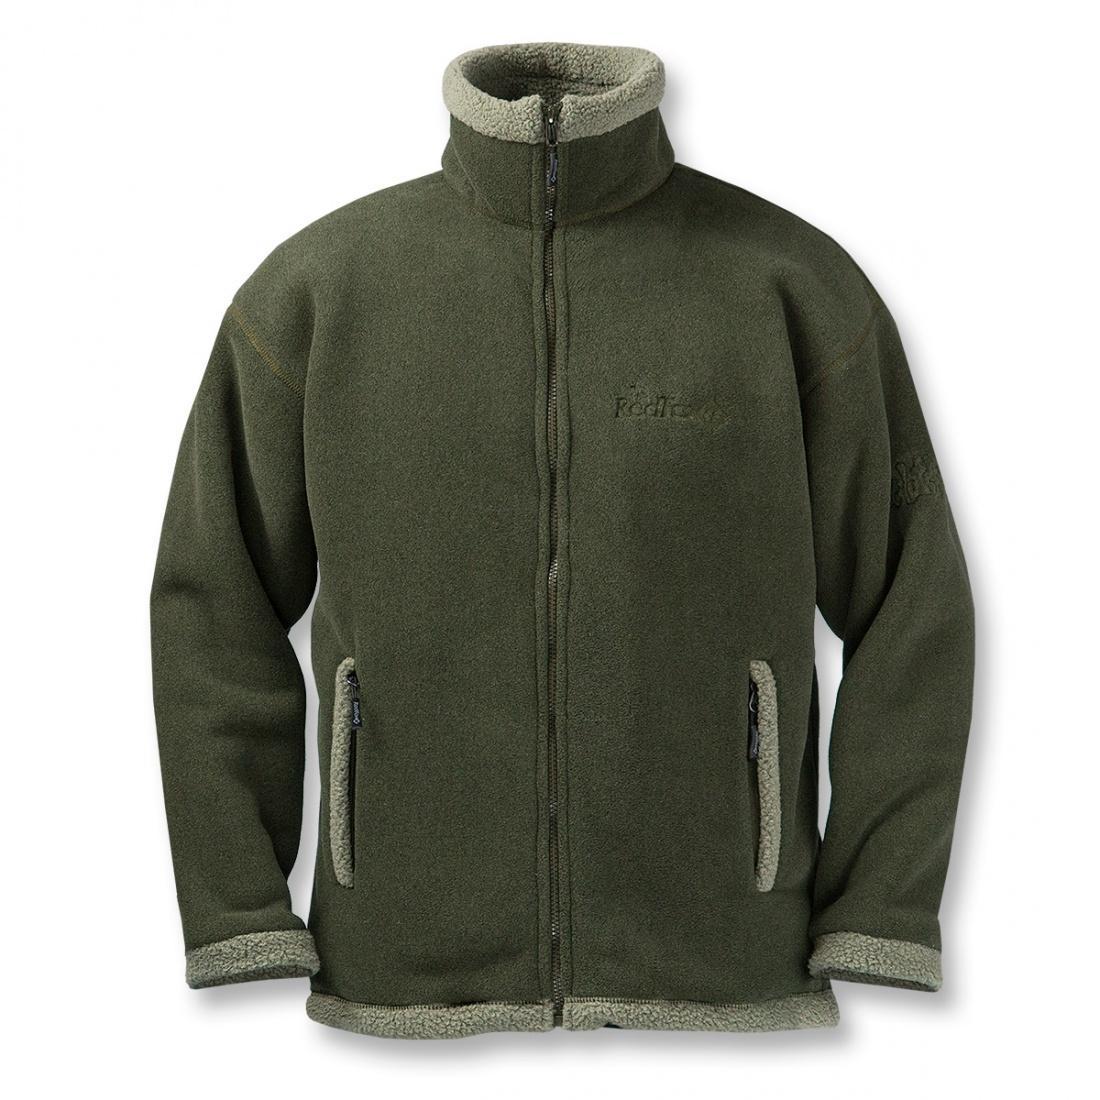 Куртка Cliff МужскаяКуртки<br><br><br>Цвет: Хаки<br>Размер: 54